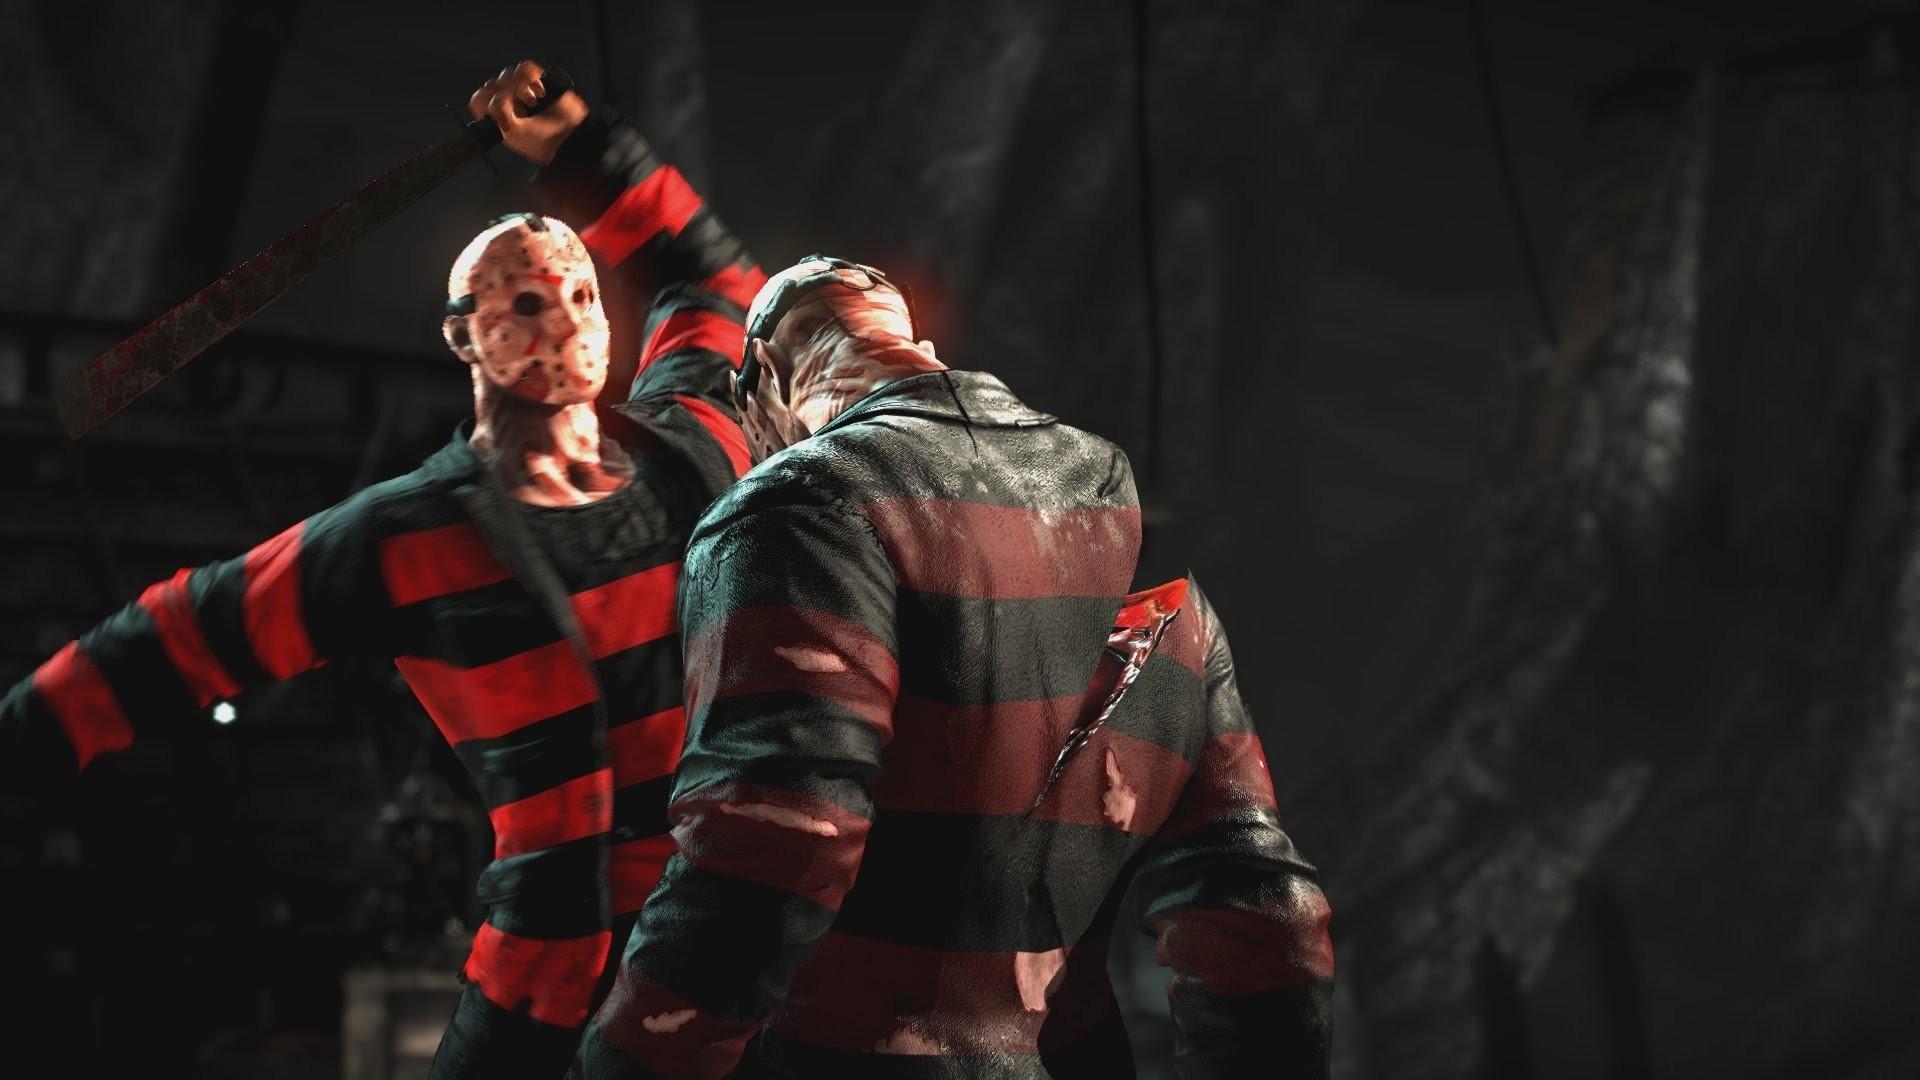 Dark Freddy Vs Jason Freddy Krueger Jason Voorhees Mortal